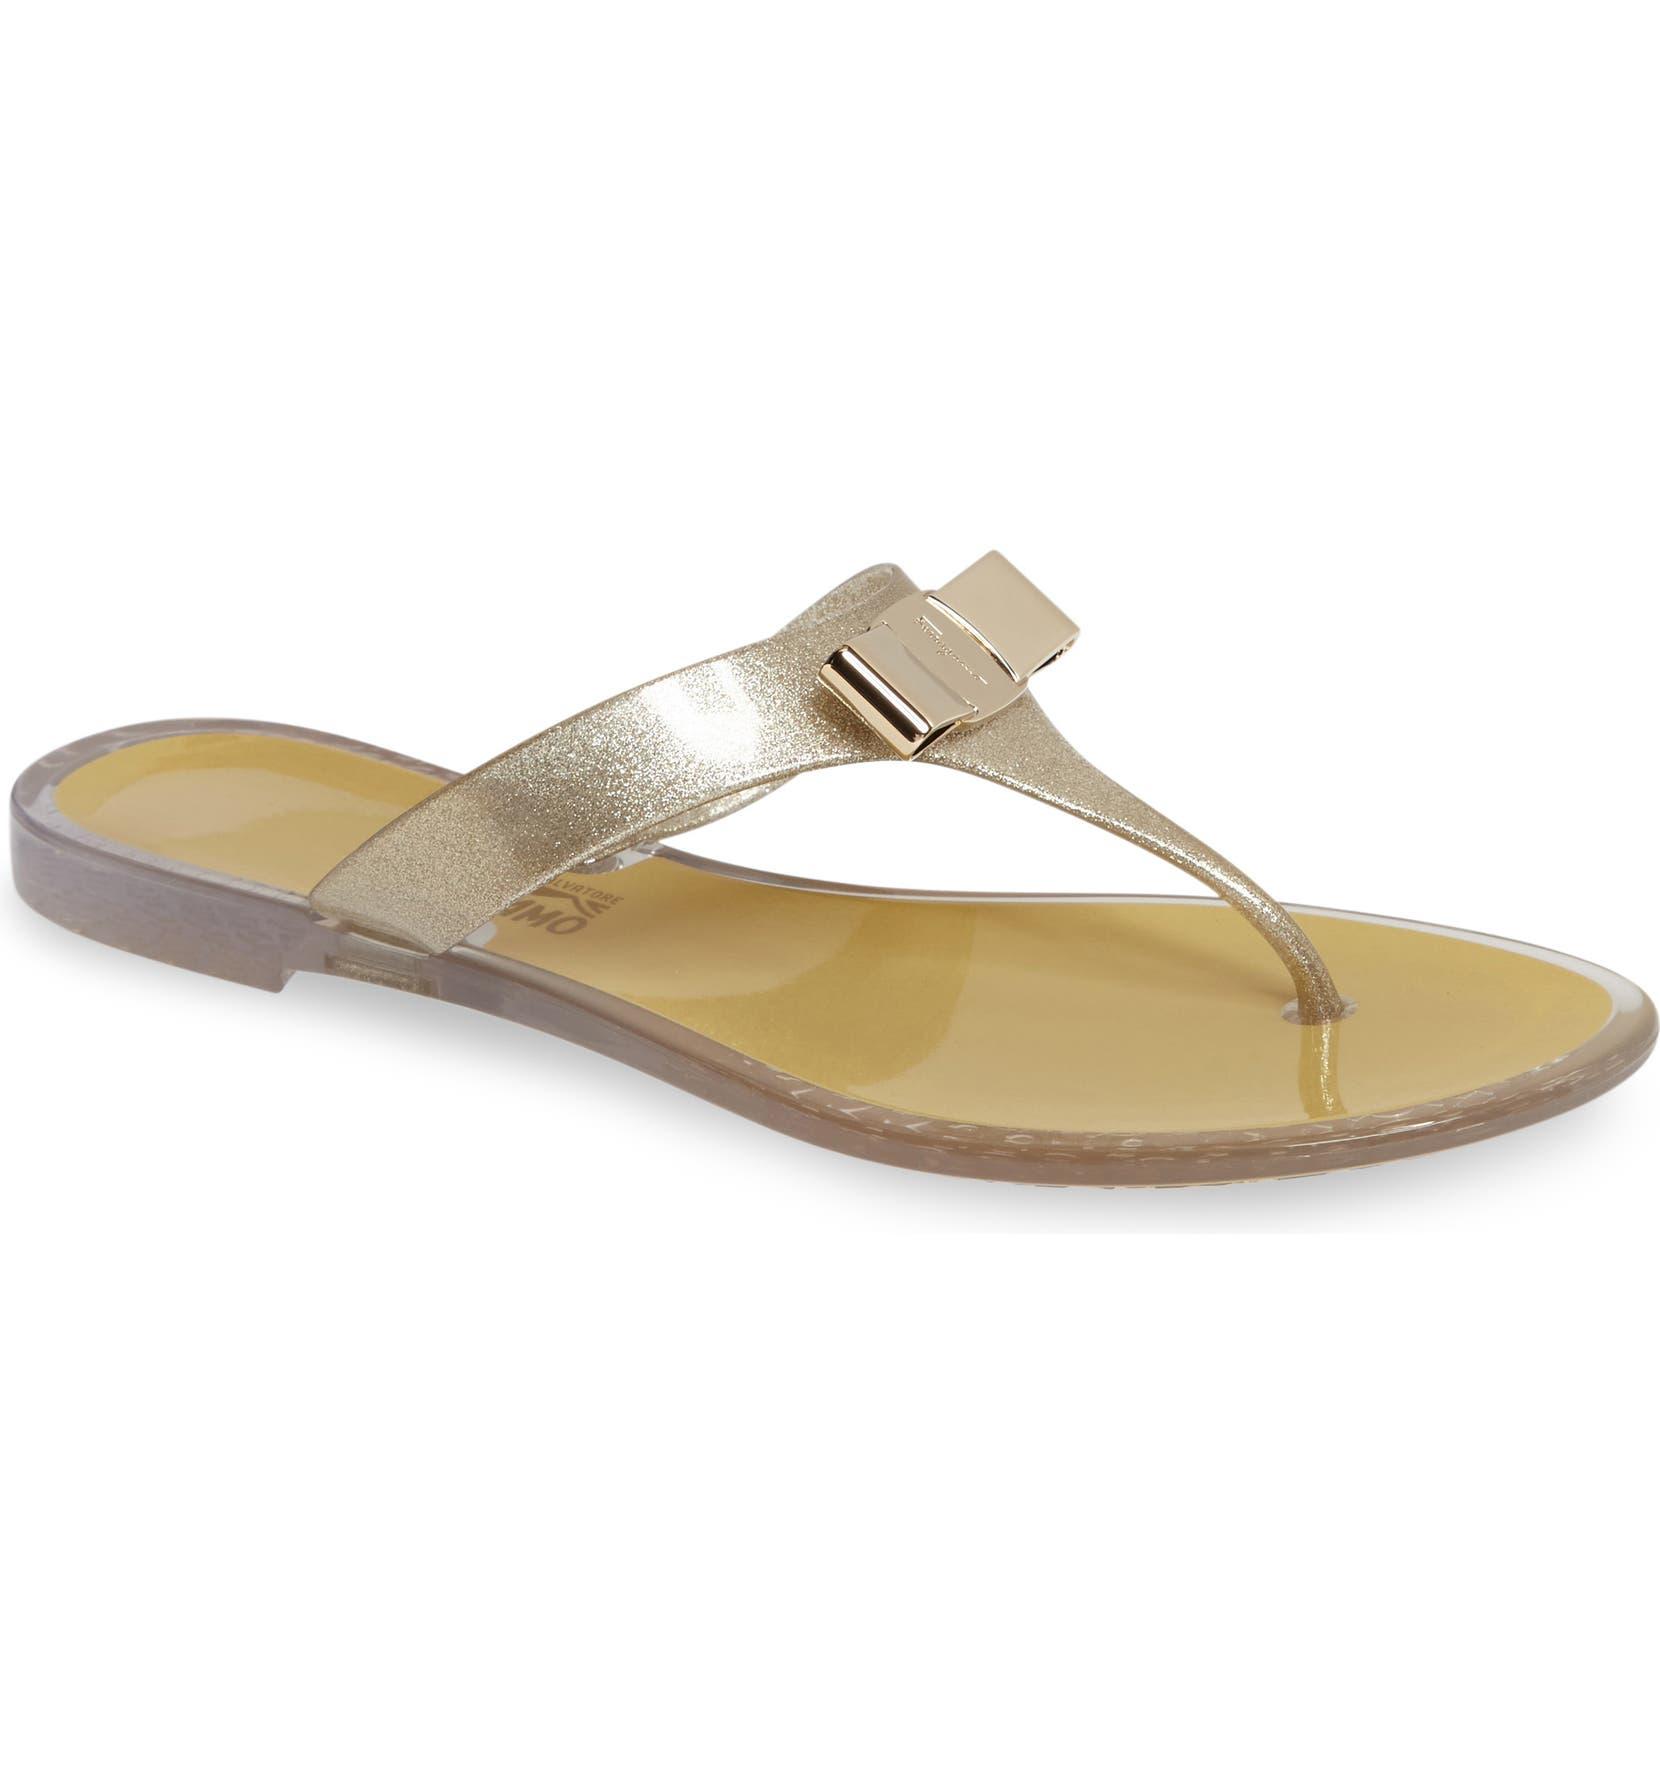 c47818113206 Salvatore Ferragamo Farelia Jelly Flat Bow Sandal (Women)